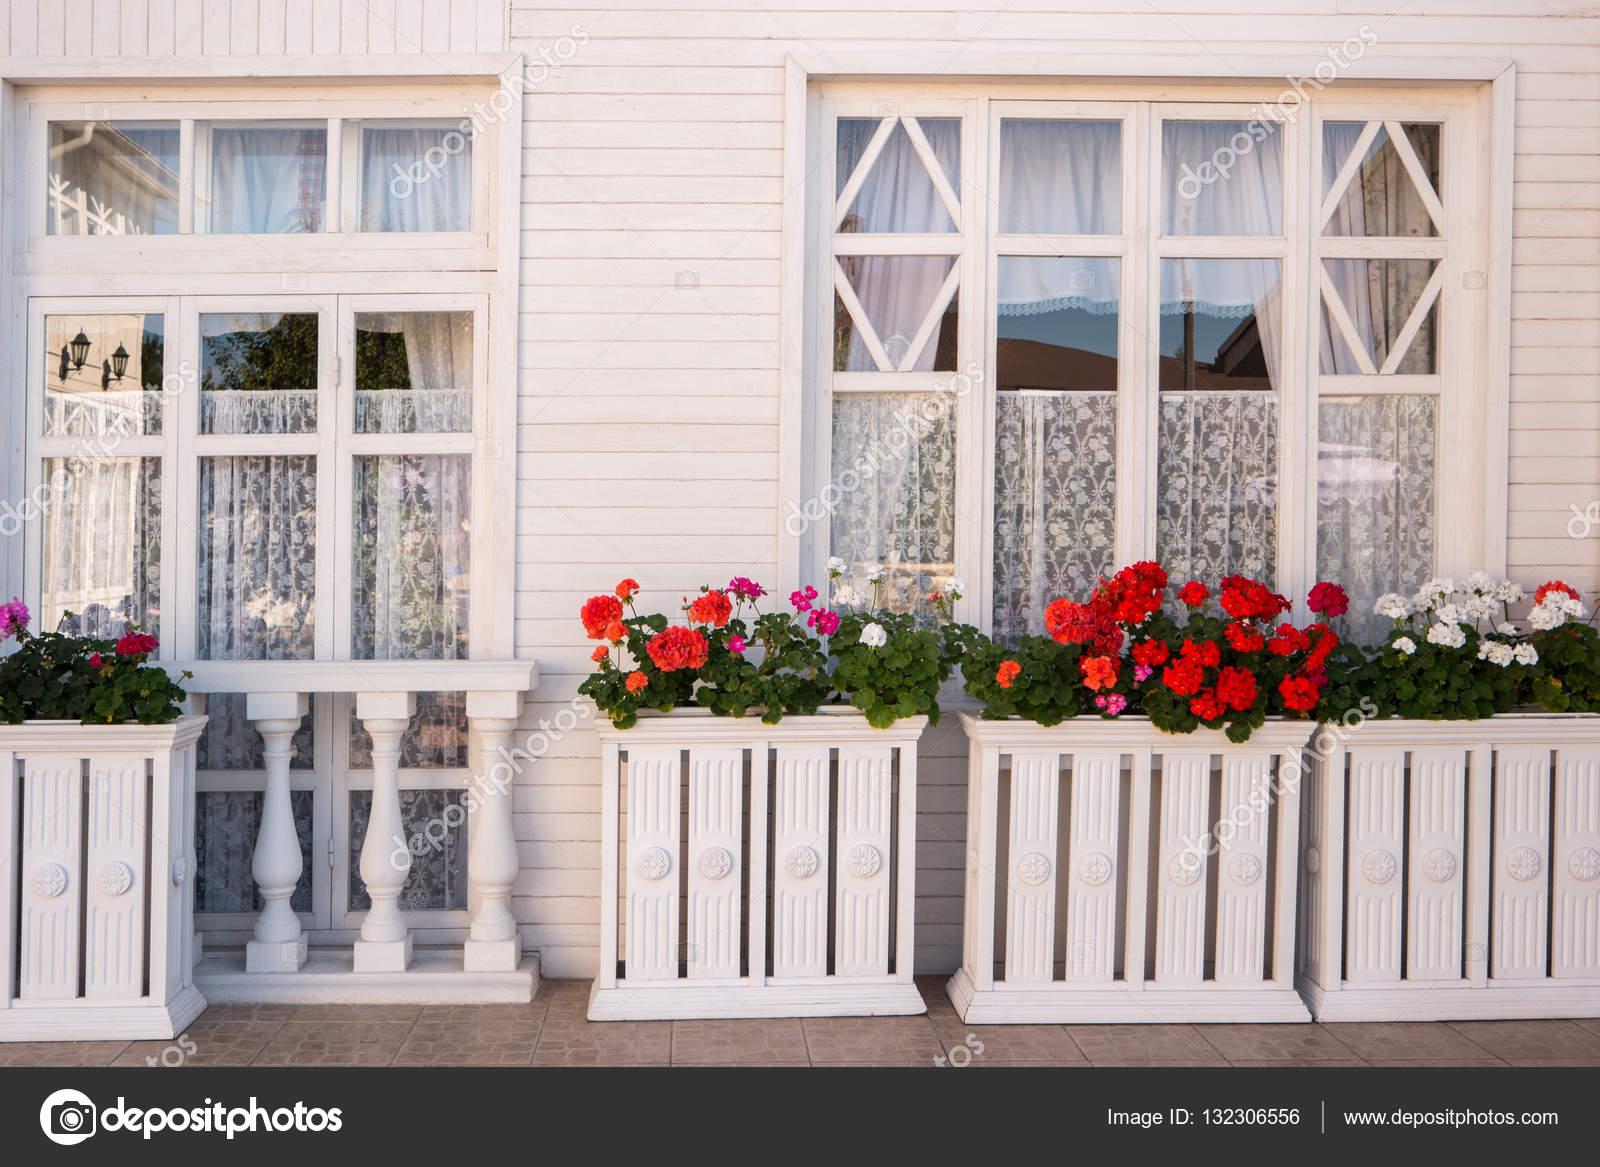 Flowers outside the house. \u2014 Stock Photo © Denisfilm 132306556